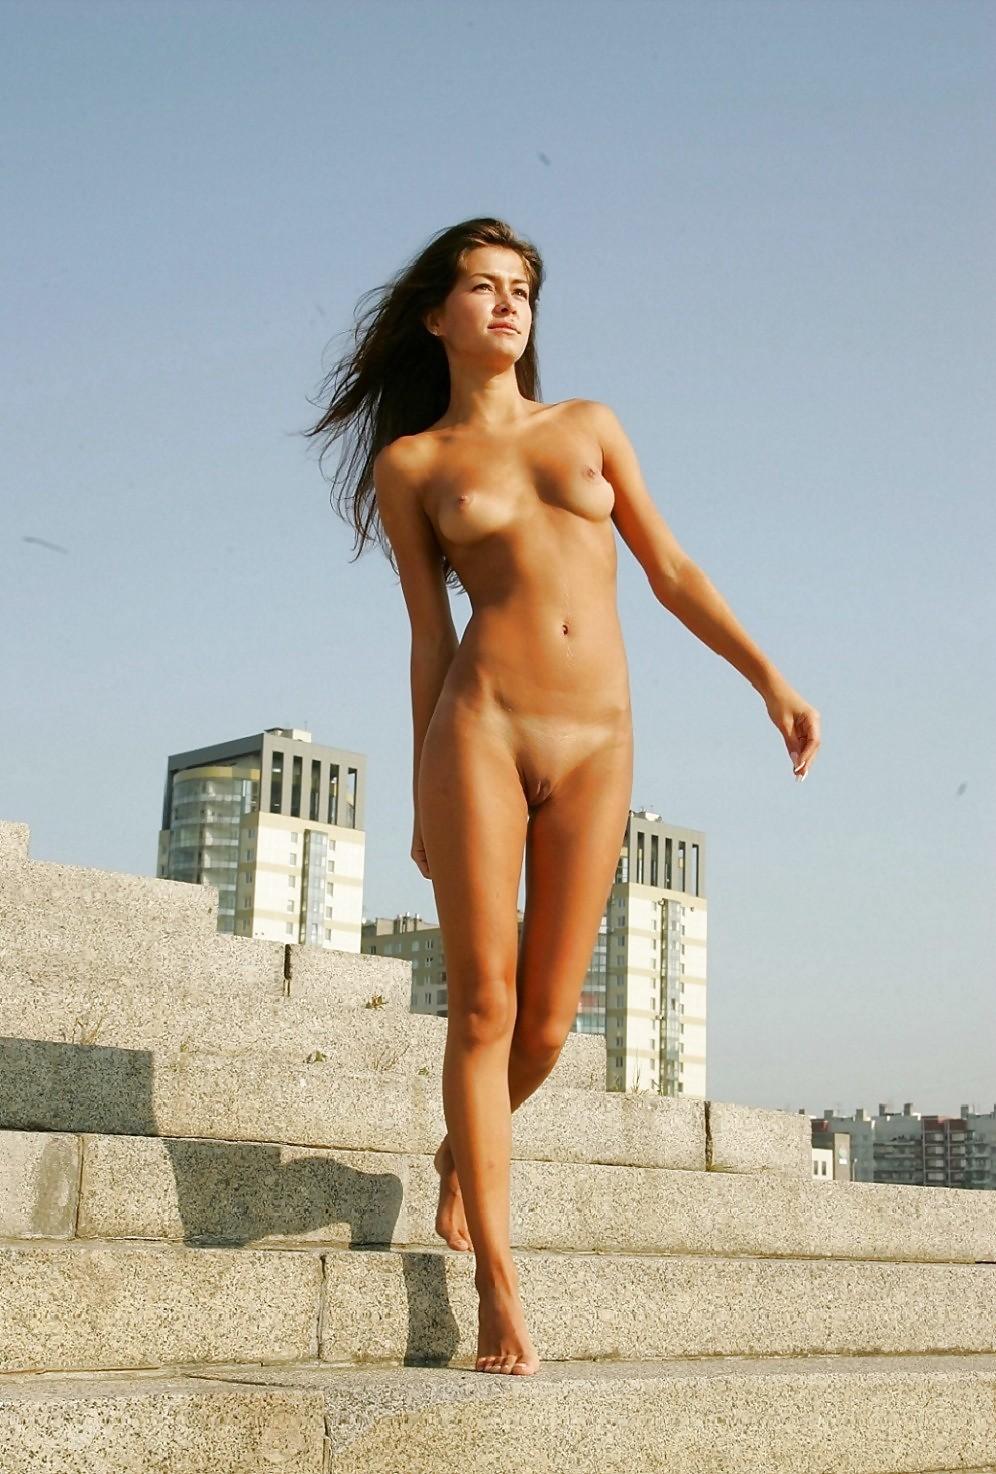 Swimsuit Naked Women Camel Toe Scenes